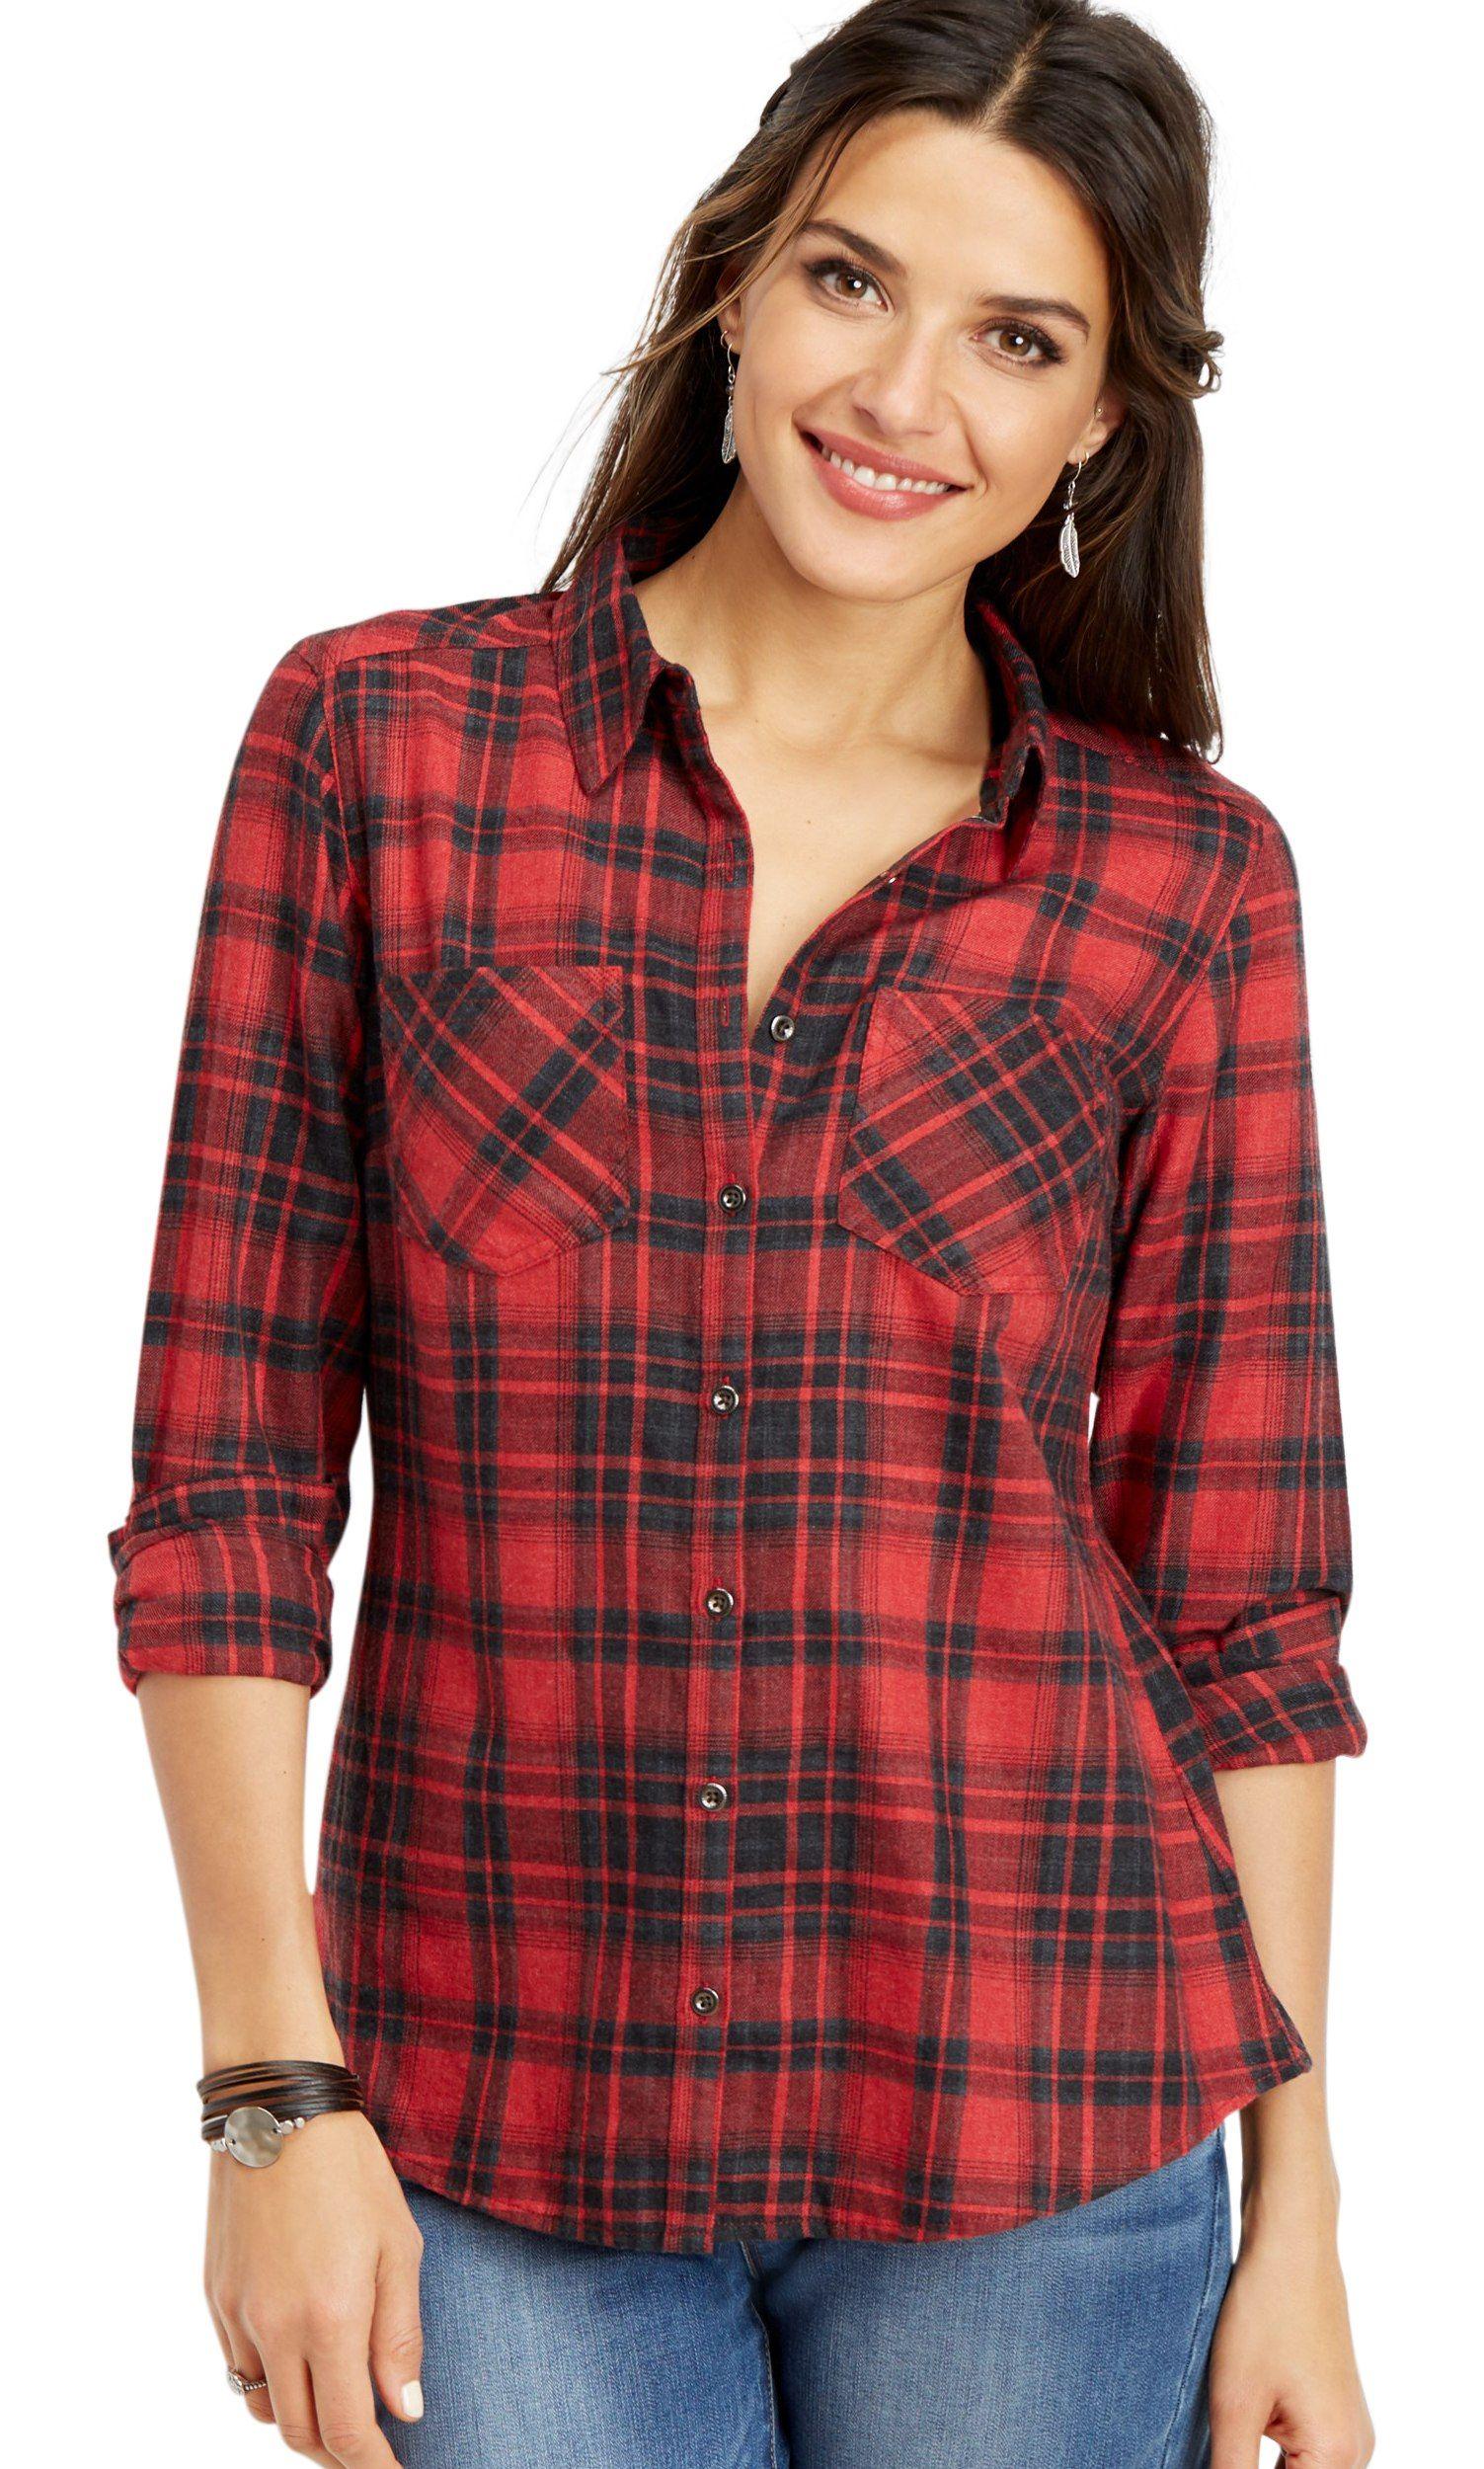 Plaid Button Down Shirt Walmart Com Shirts Plaid Plaid Button [ 2500 x 1503 Pixel ]